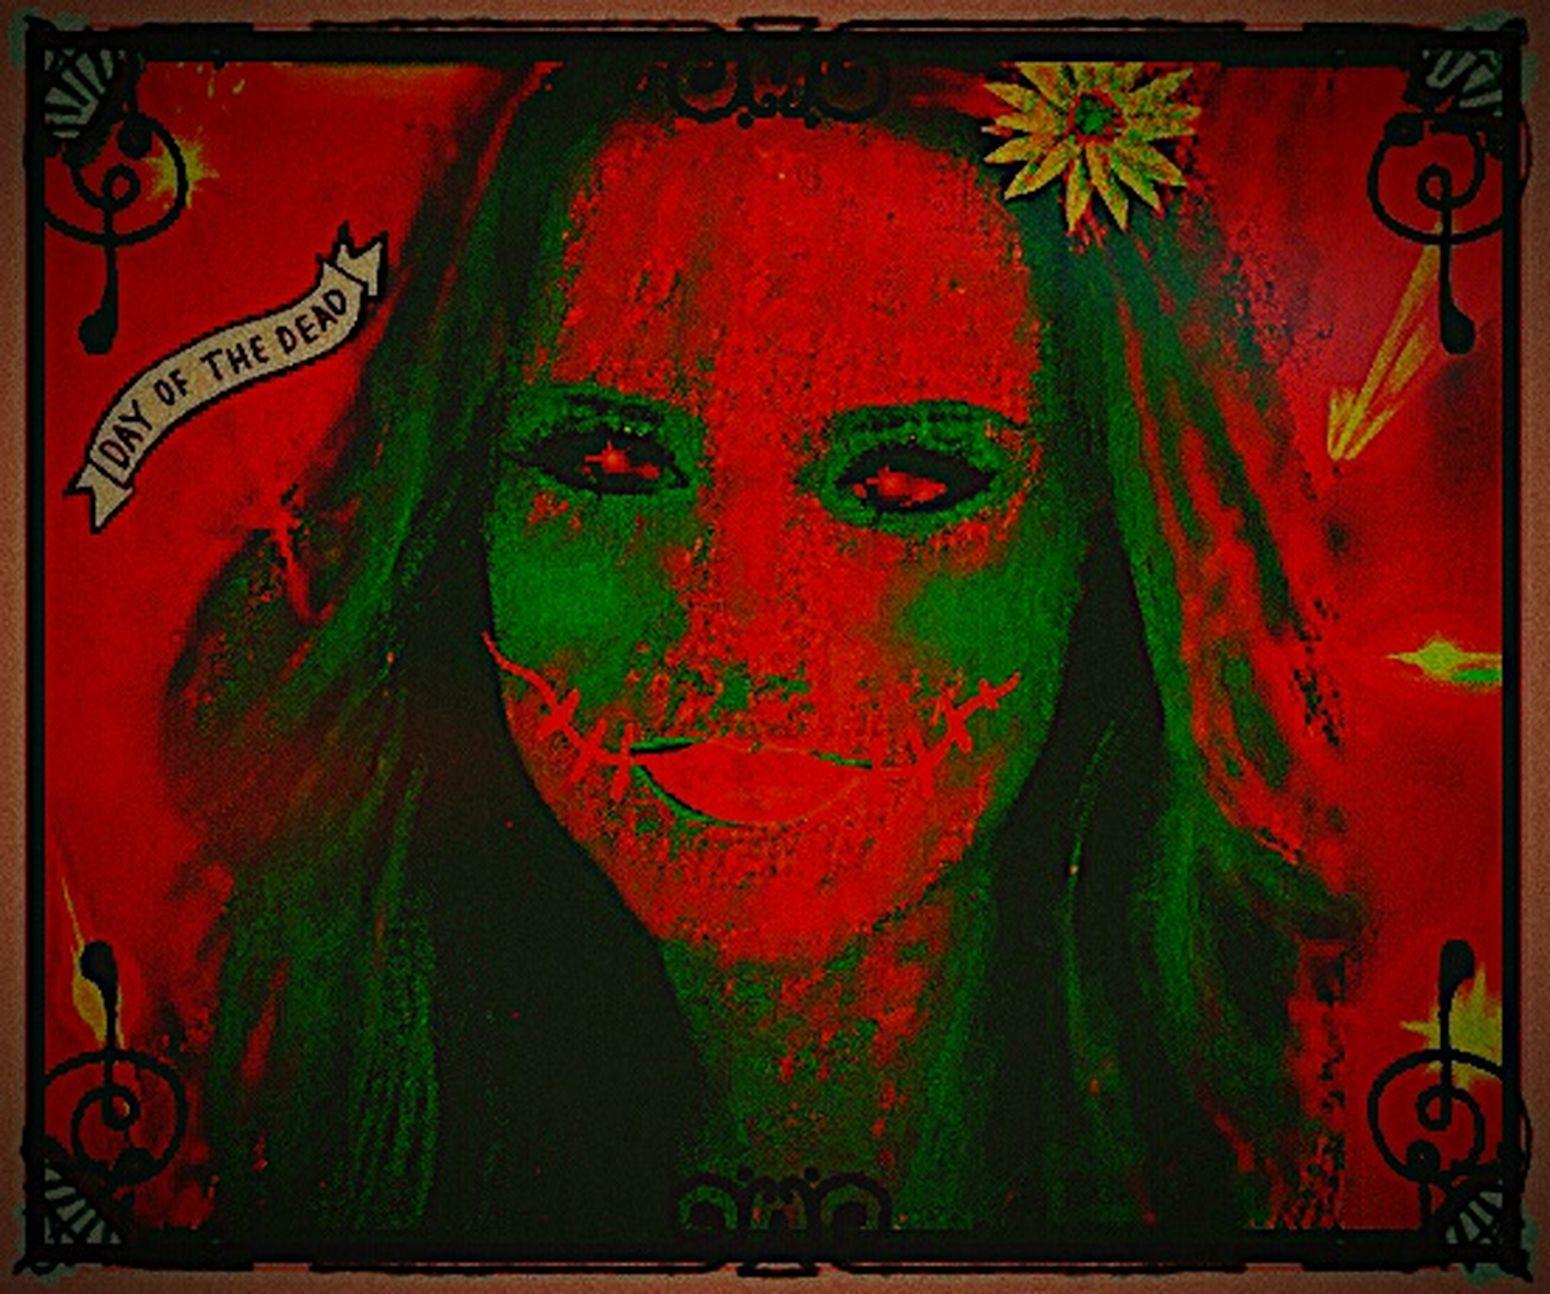 Red Portrait Looking At Camera Close-up Digital Manipulation Digitalart  Digital Art Illustration Human Representation Eye Em Best Shots Digital Imaging Creativity Vibrant Color Auto Post Production Filter EyeEm Best Edits EyeEmBestEdits Eyeemphotography Smiling Multi Colored Abstract Mardi Gras Mask  Dayofthedead Dayofthedeadmakeup Dayofthedeadtattoo Tattoos